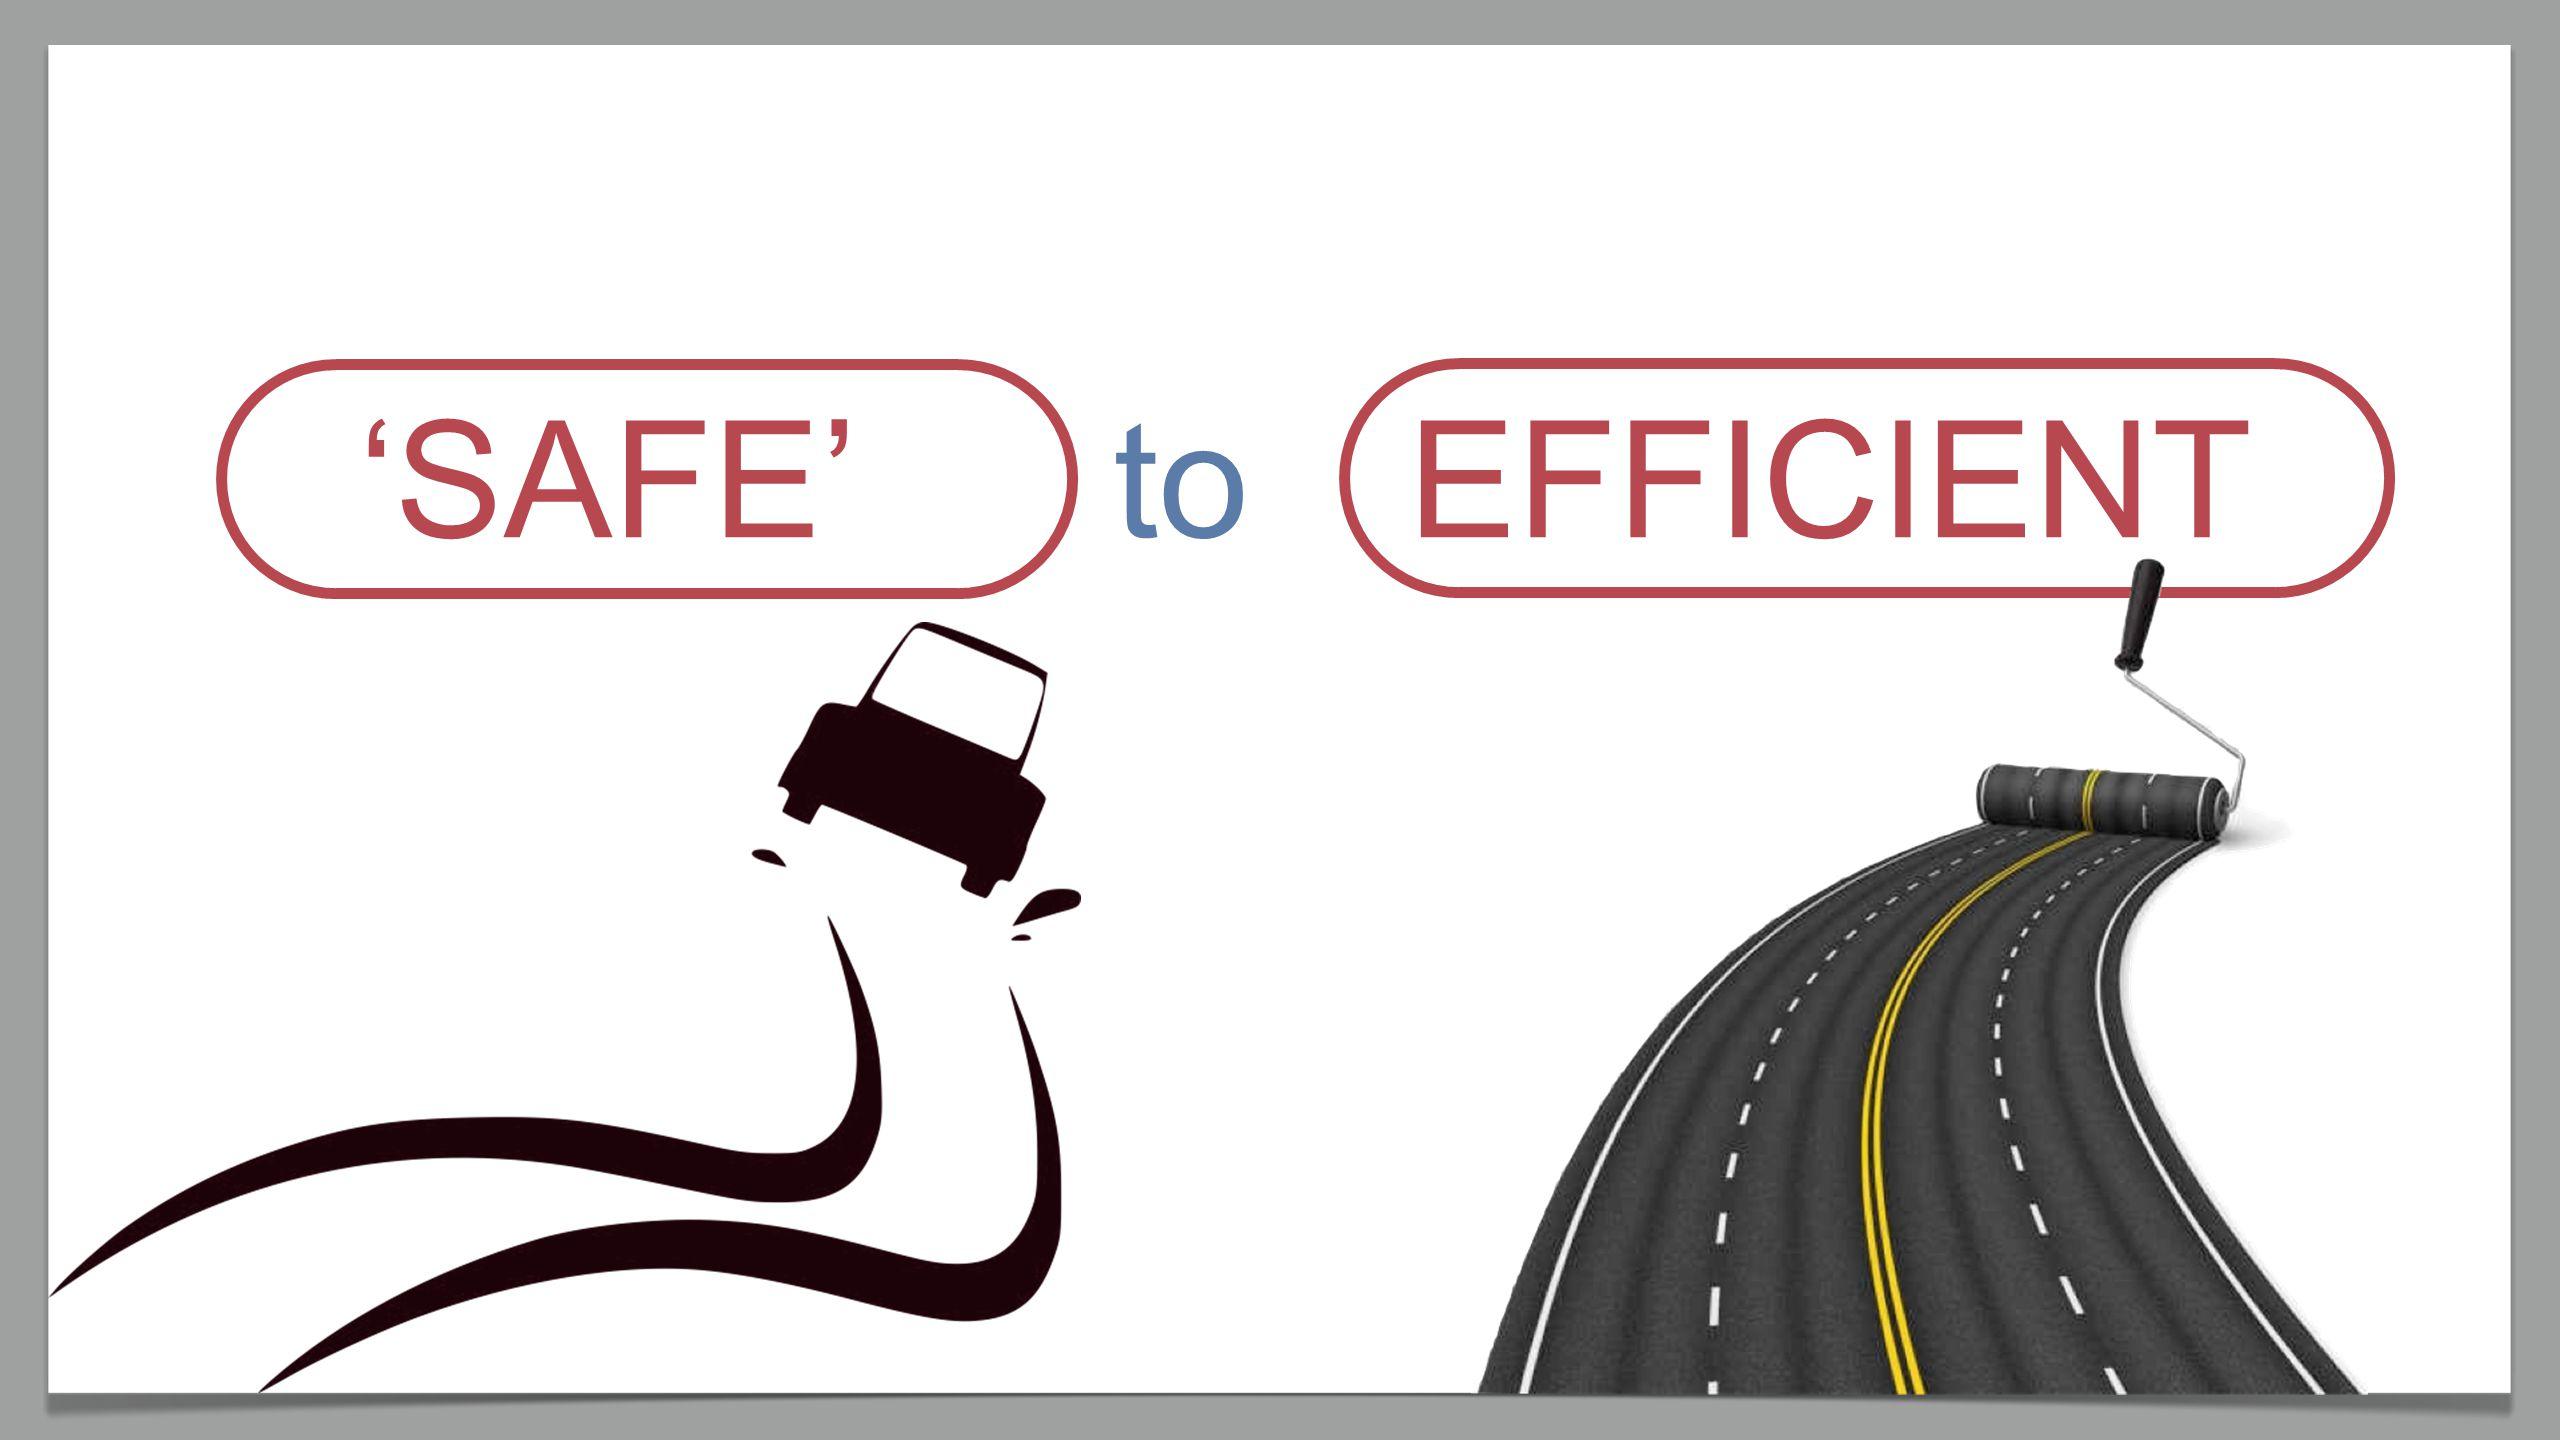 to'SAFE'EFFICIENT